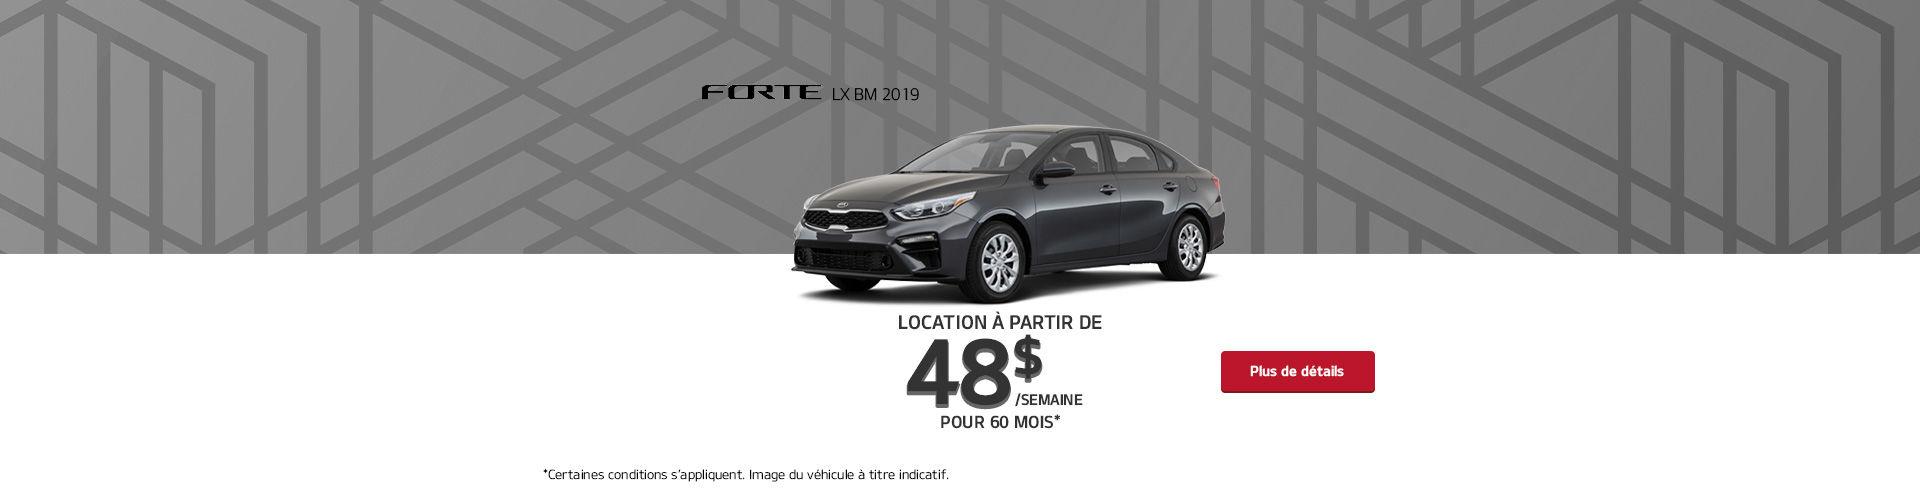 Forte 2019 - header